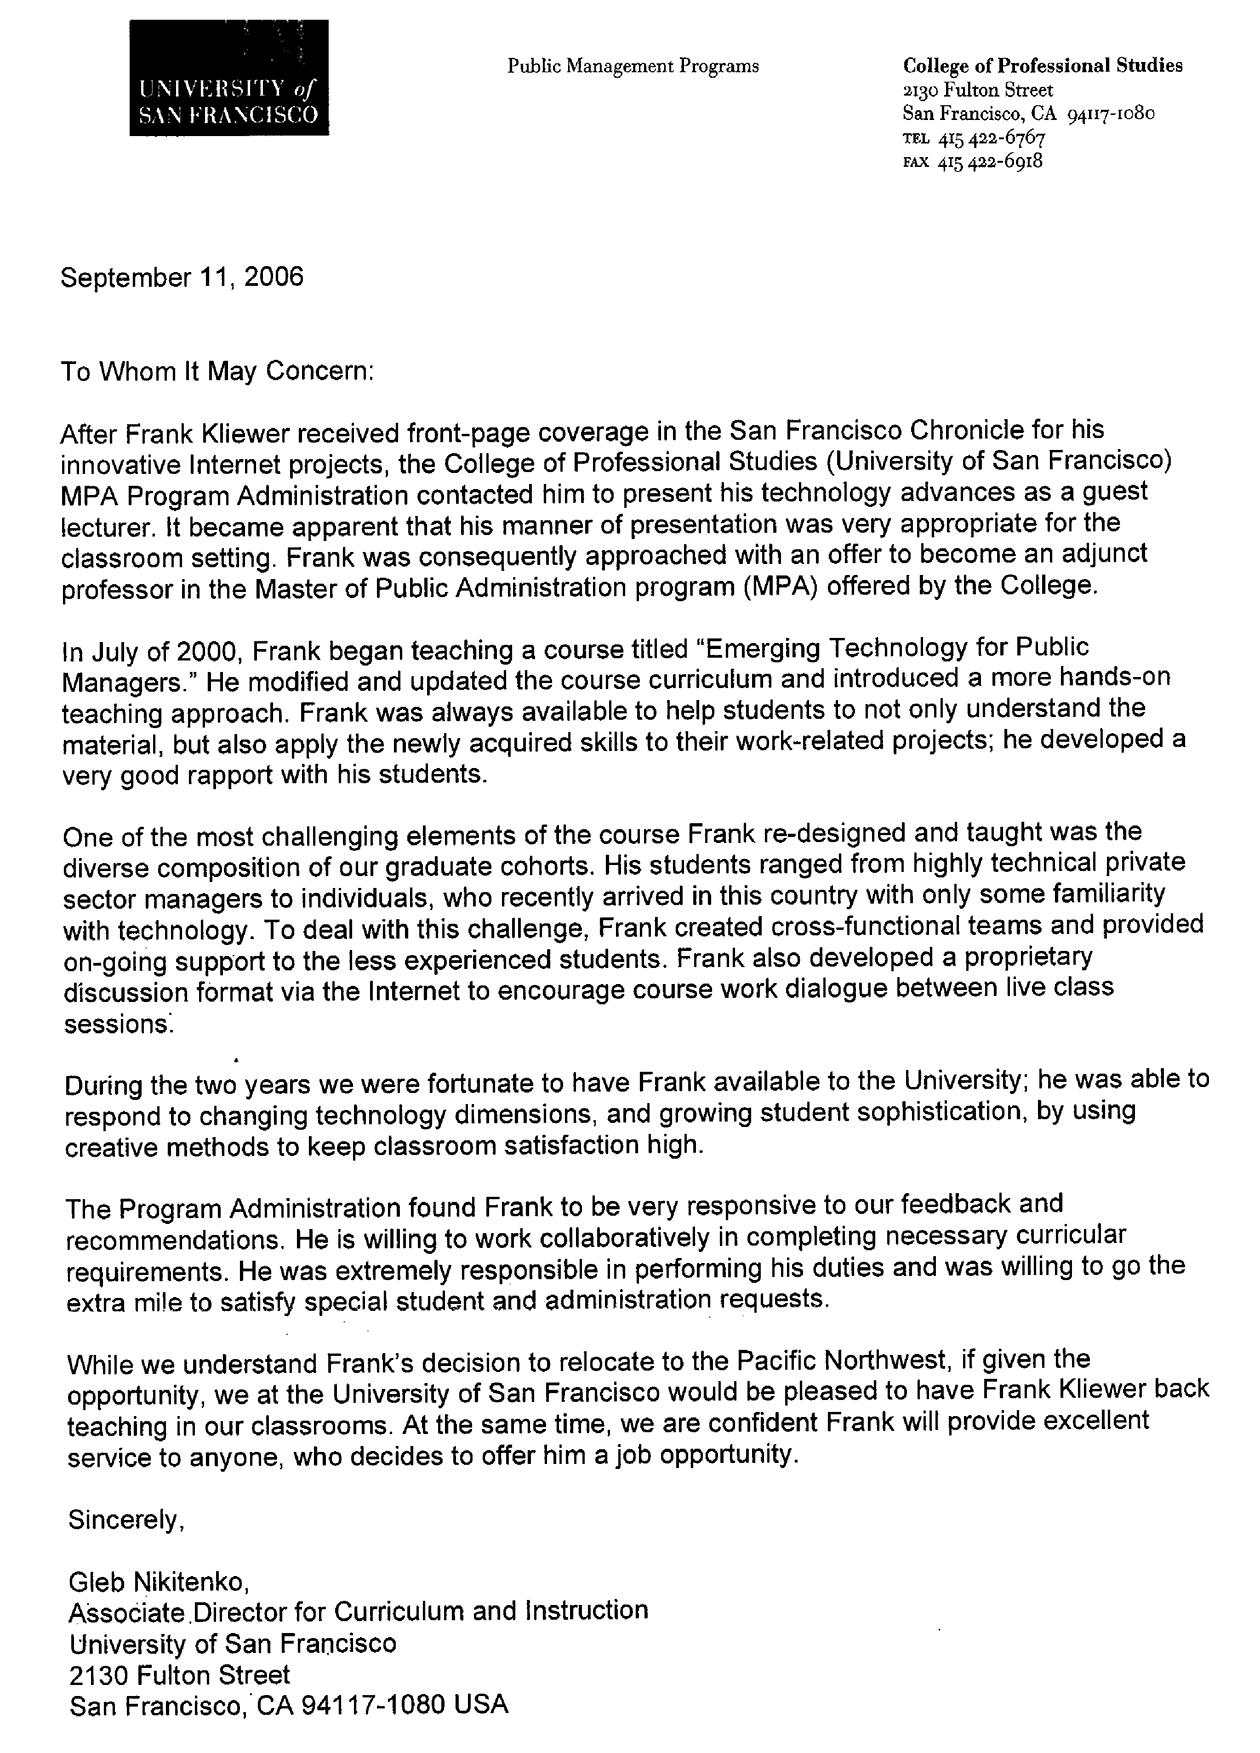 USF Letter